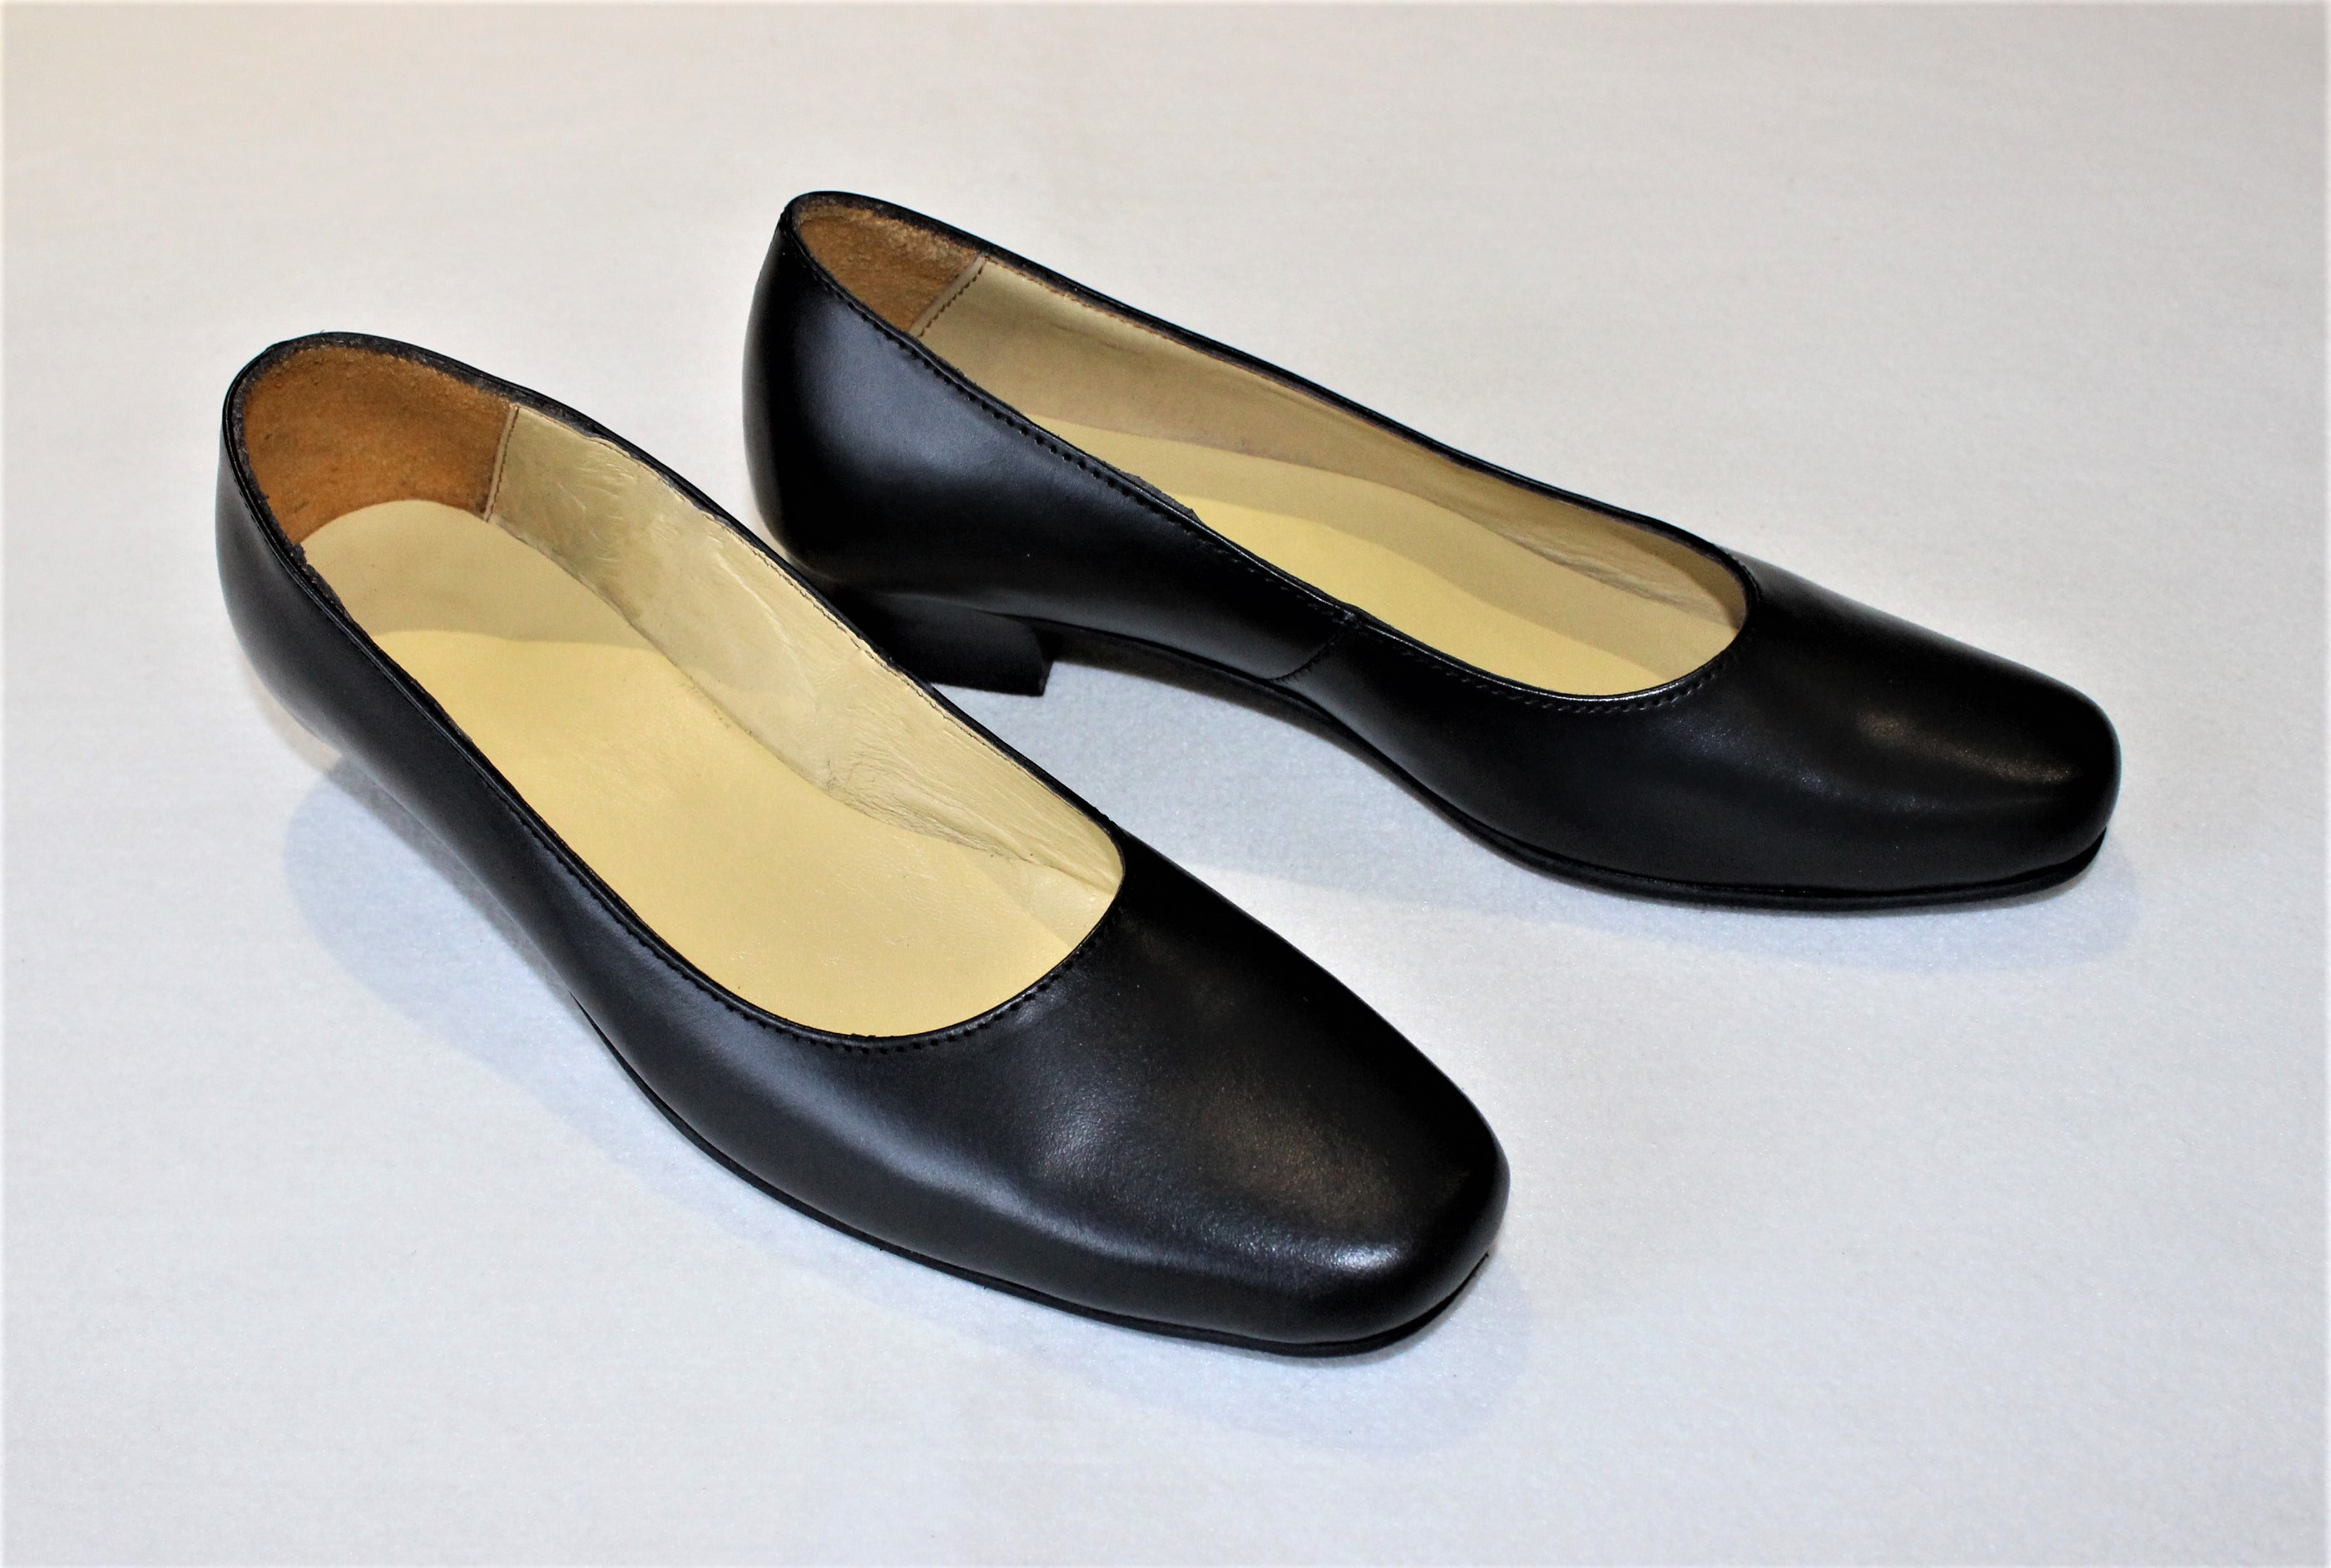 8da851c1333 Free photo  Female Shoes - Pretty